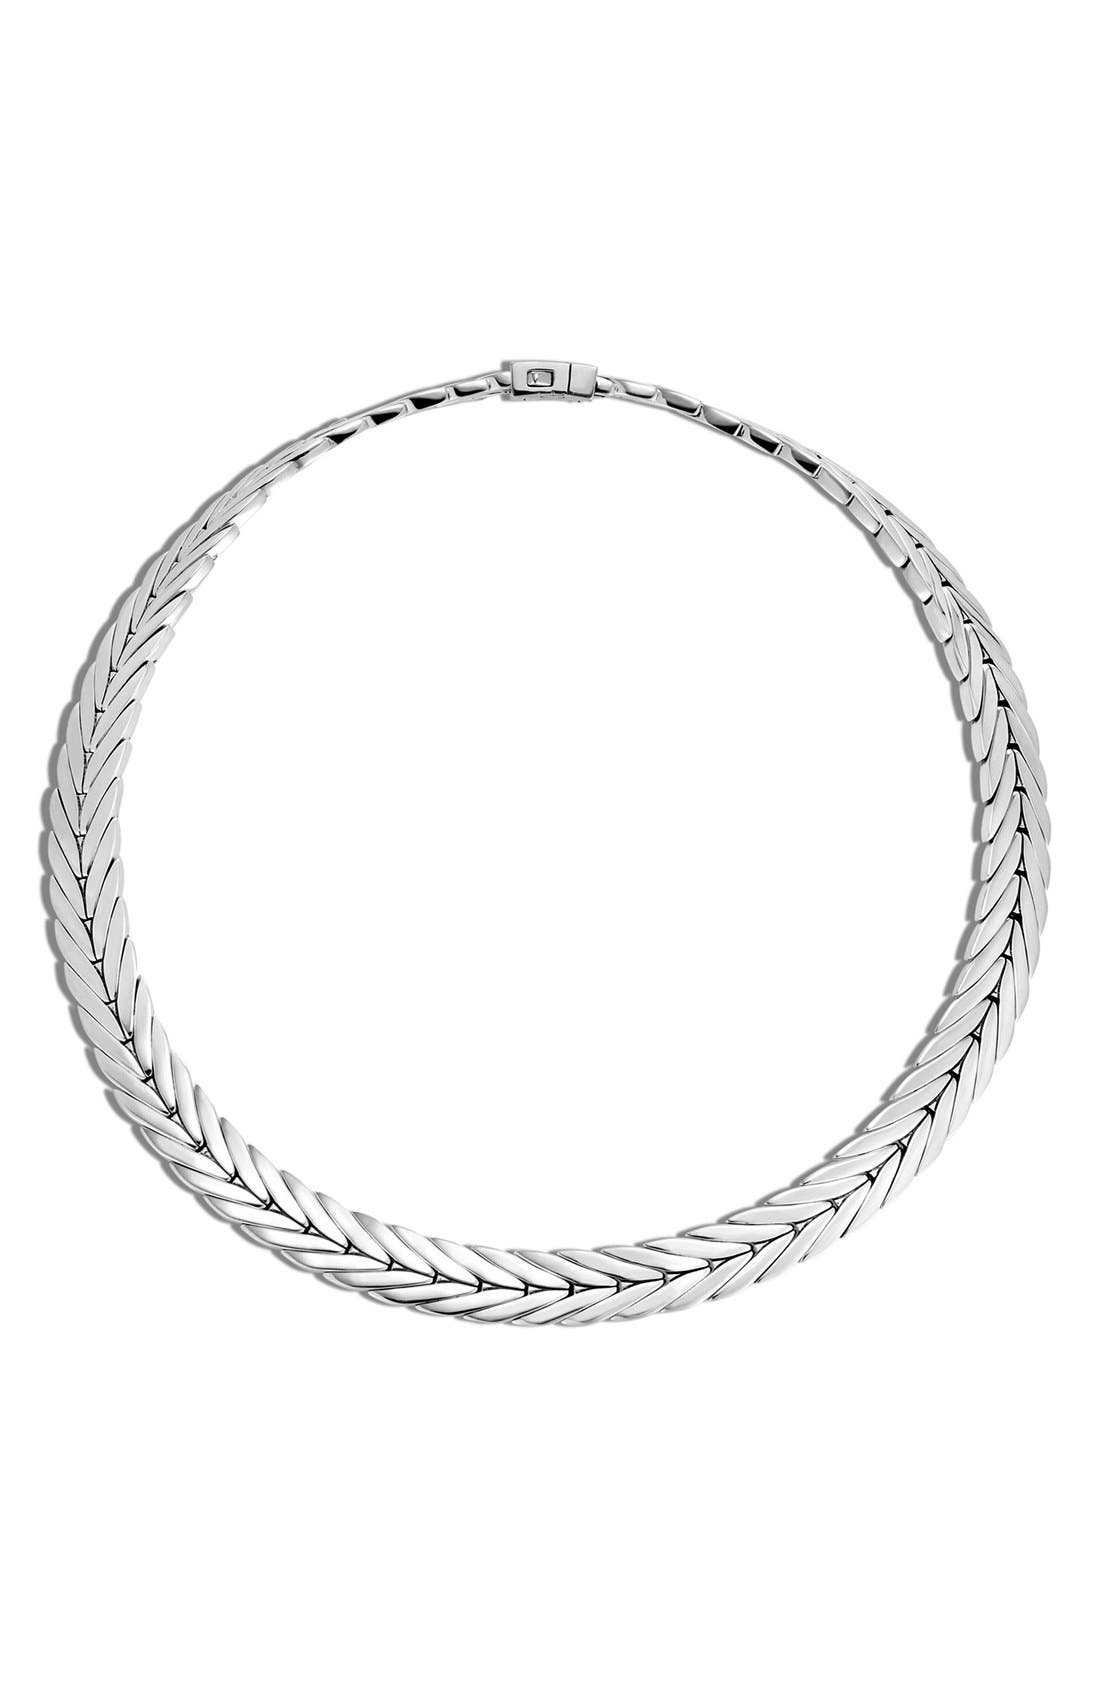 Main Image - John Hardy 'Classic Chain' Chain Collar Necklace